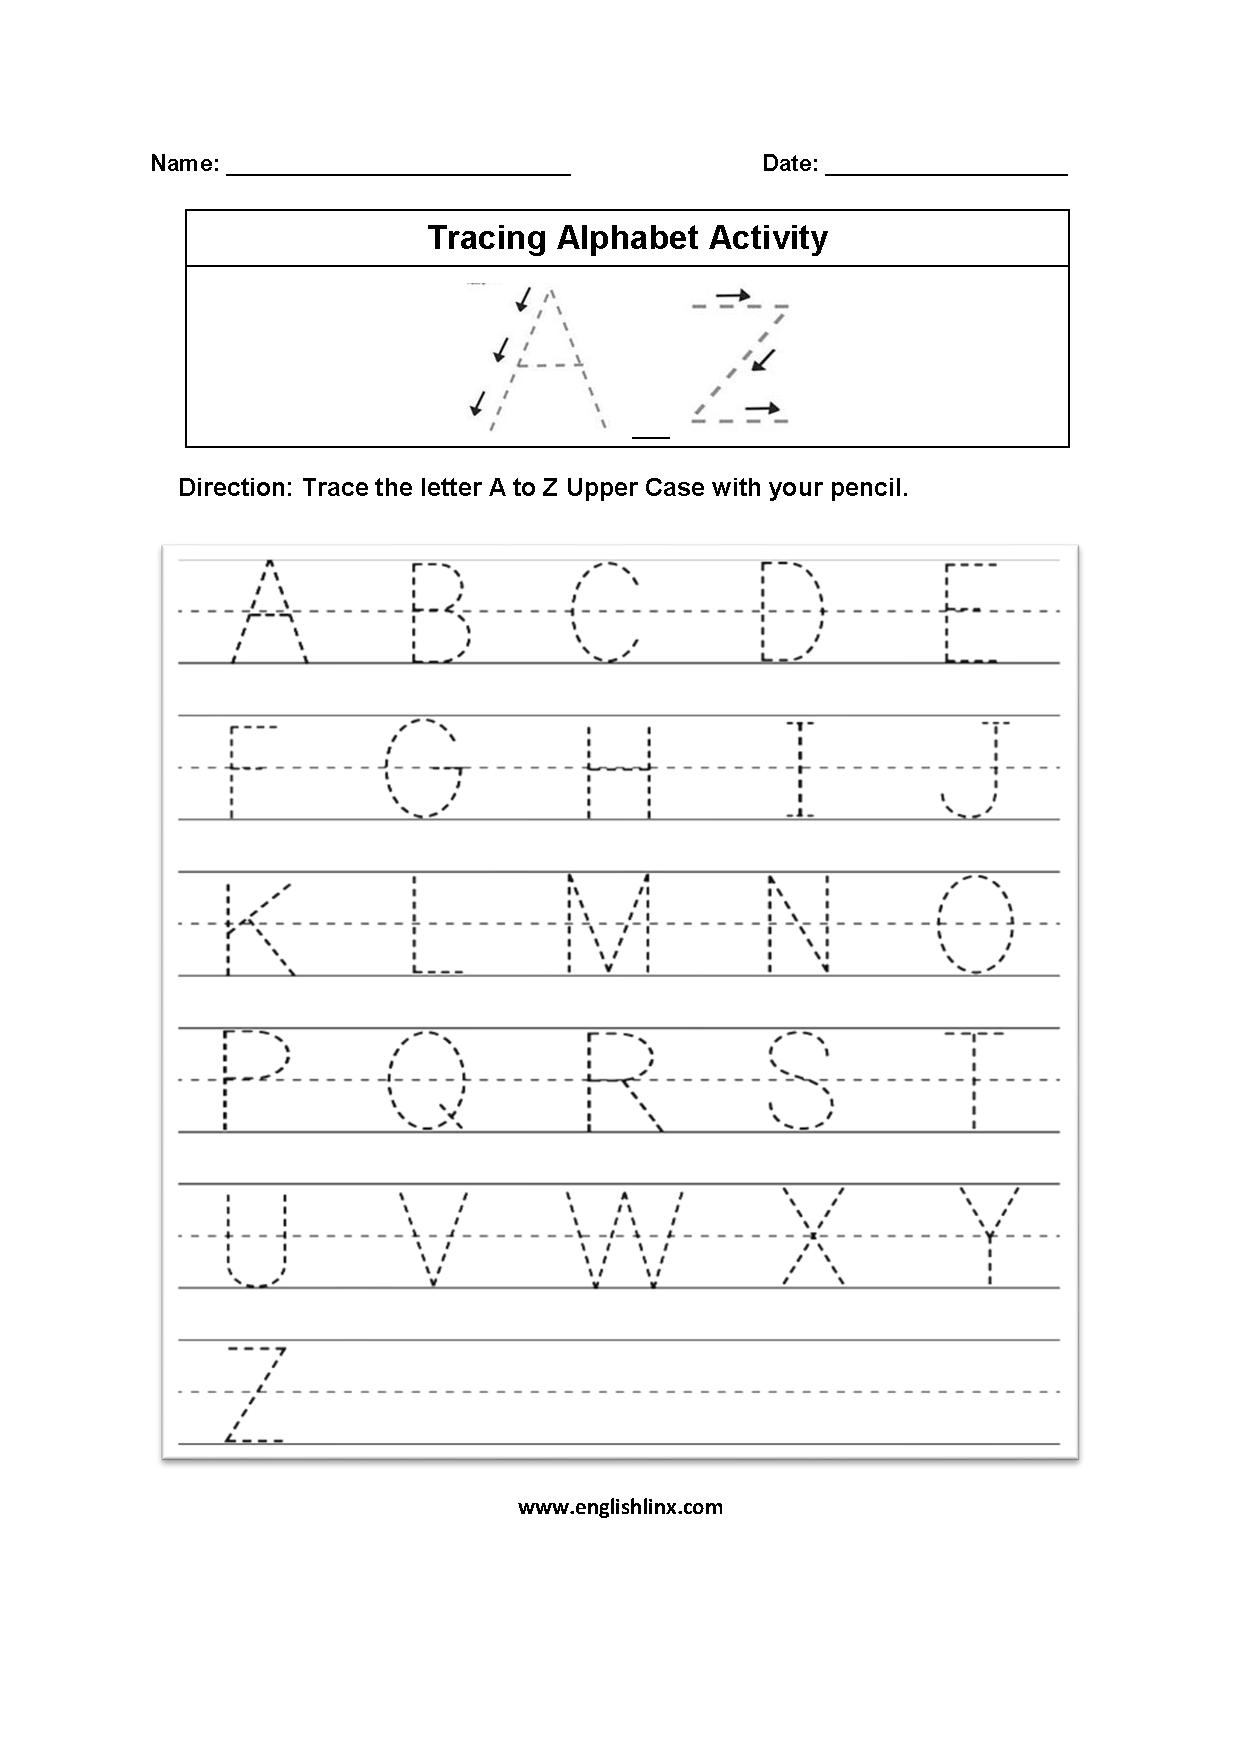 A To Z Alphabet Worksheets Pdf لم يسبق له مثيل الصور + Tier3.xyz